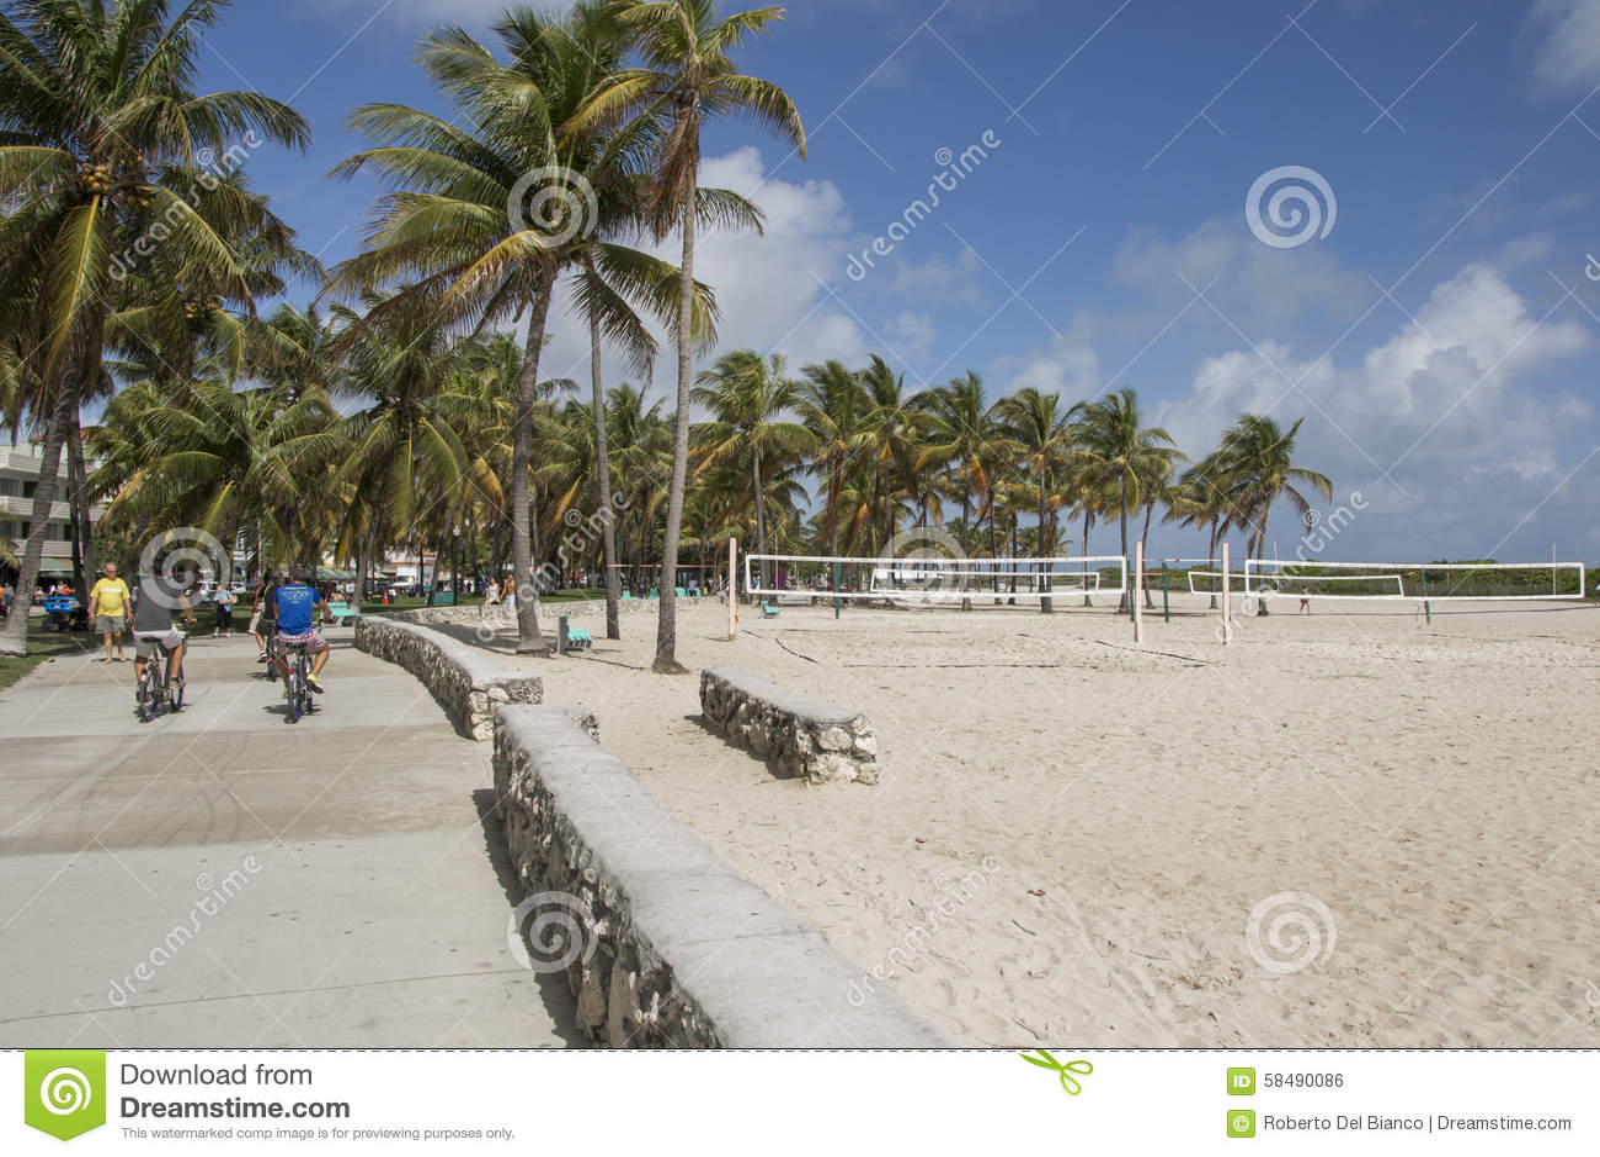 miami beach dating